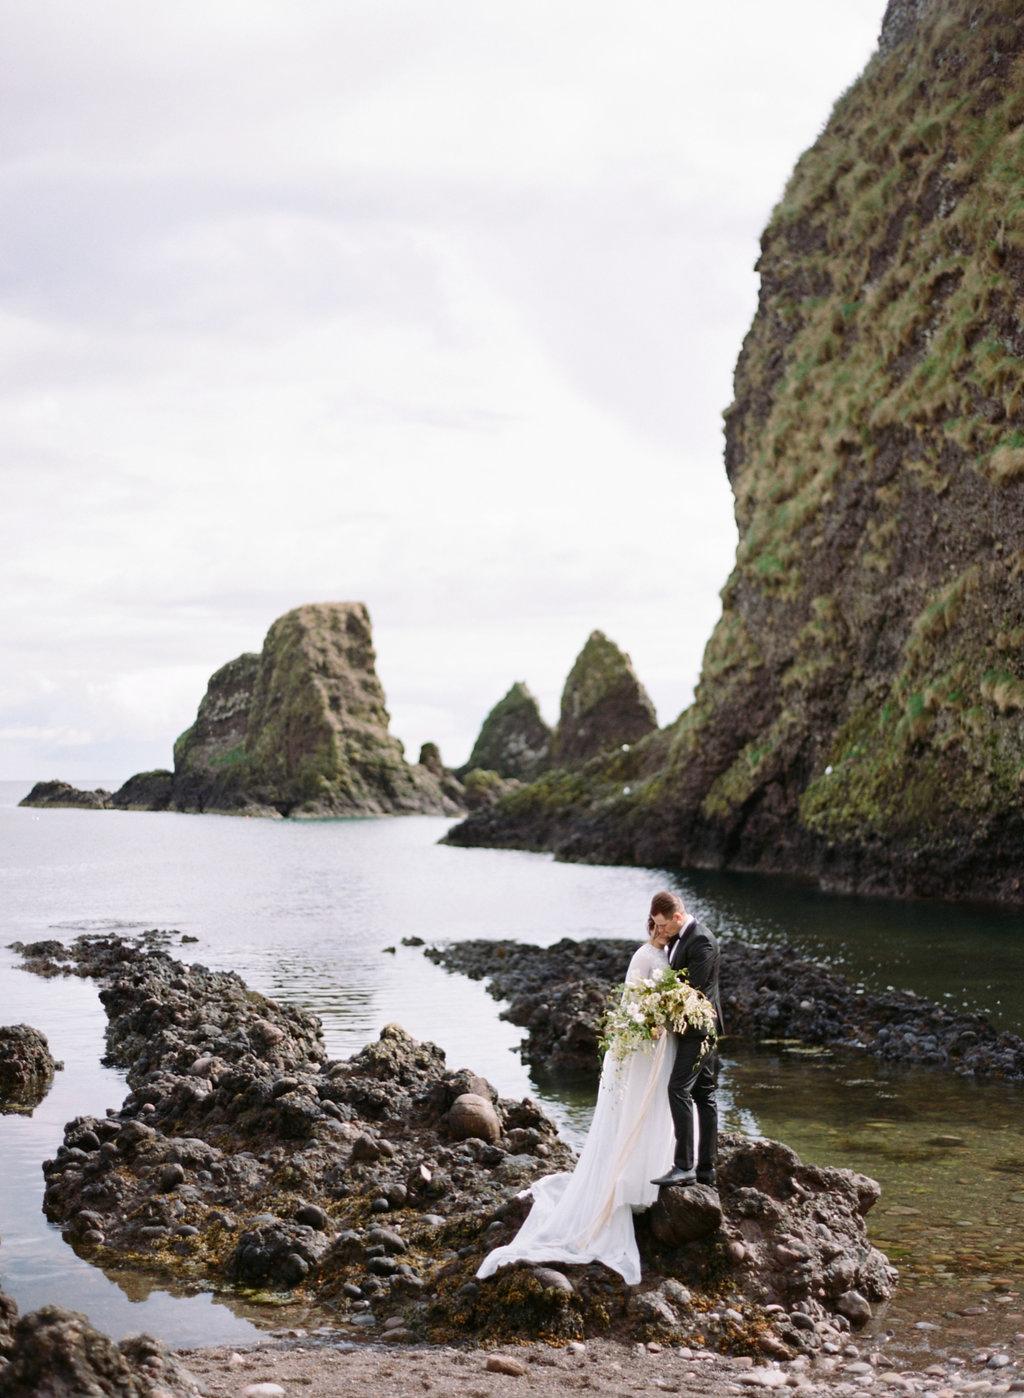 Scotland-Prewedding-highlands-castle-Engagment-Photos-Katie-Grant (139 of 139).jpg